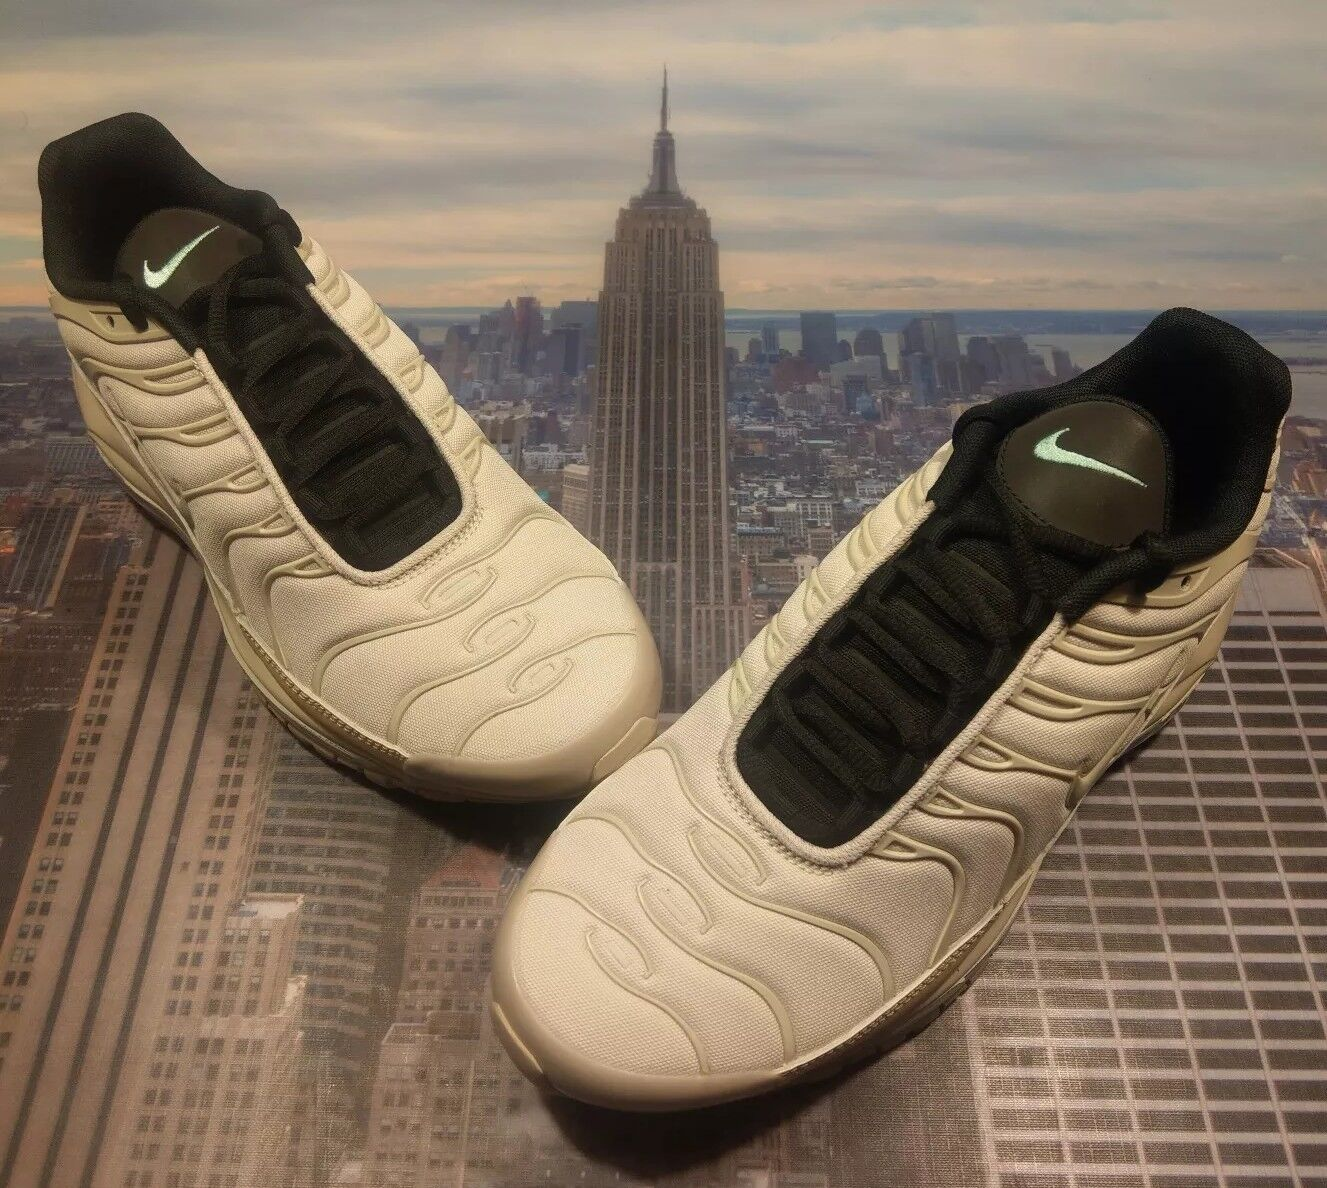 Nike Air Max 97   Plus Light Orewood Brown Rattan Size 9.5 AH8144 101 New 95 90